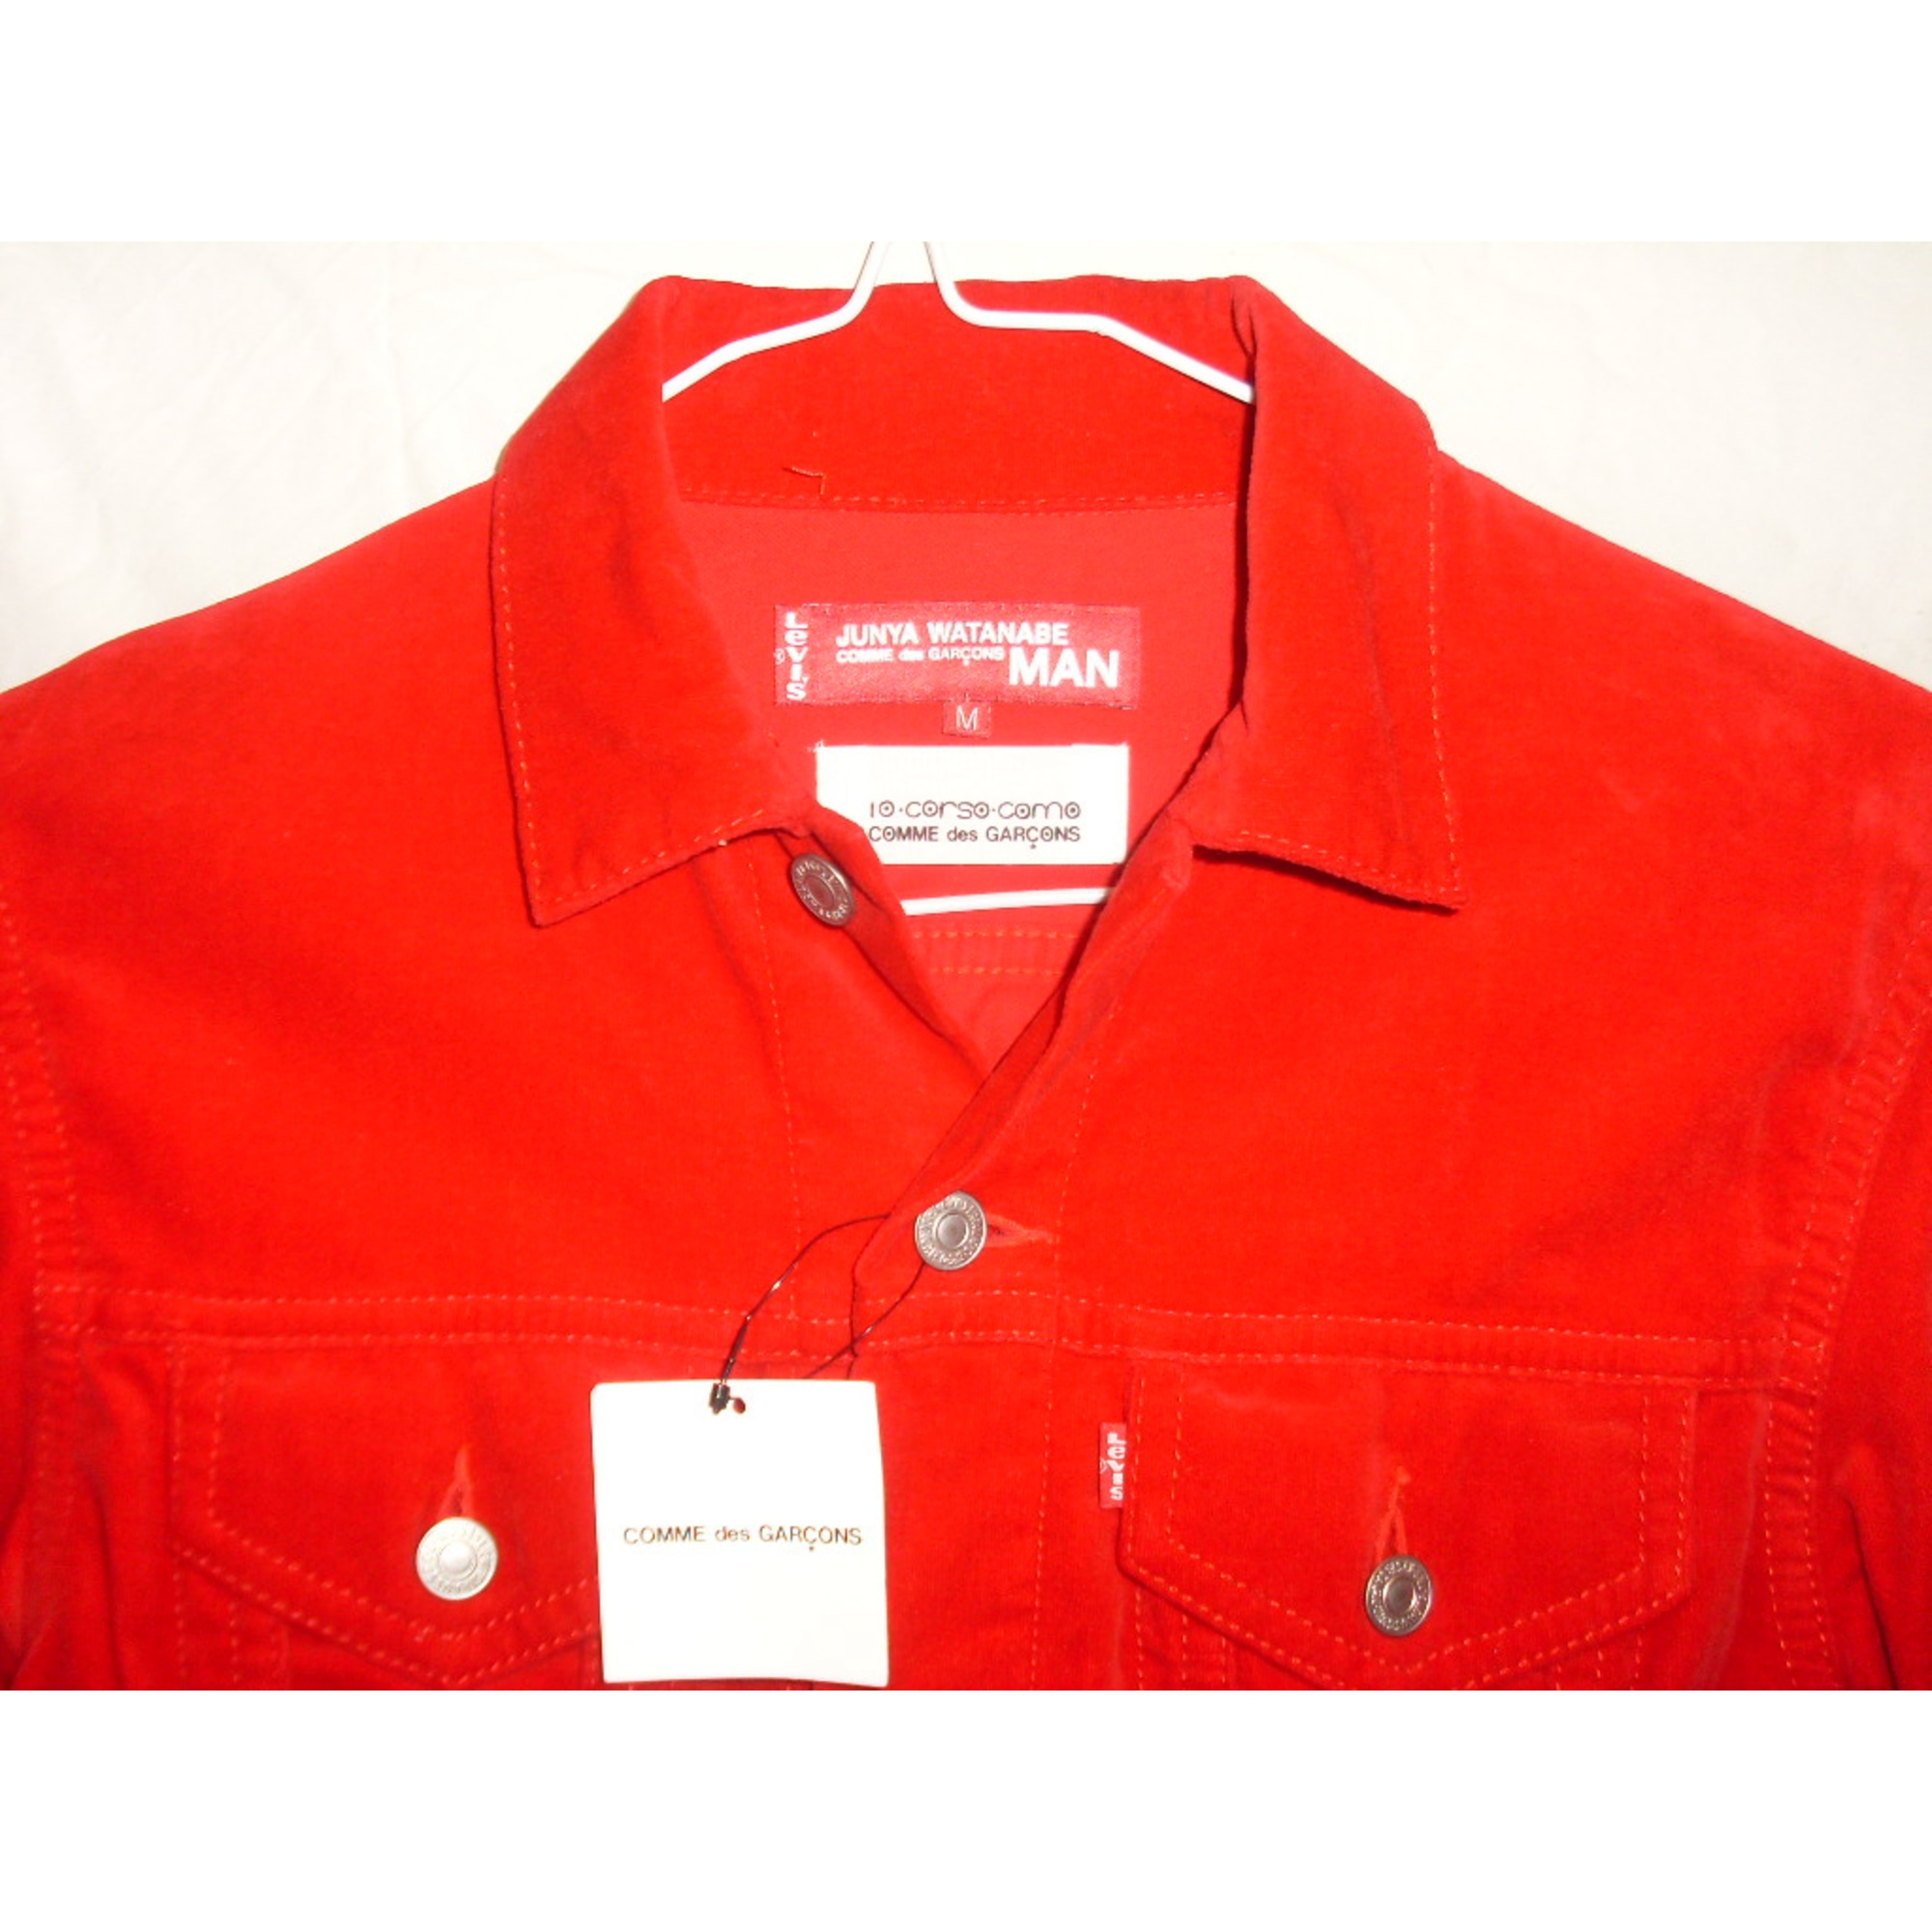 veste en jean comme des garcons 46 s rouge vendu par. Black Bedroom Furniture Sets. Home Design Ideas